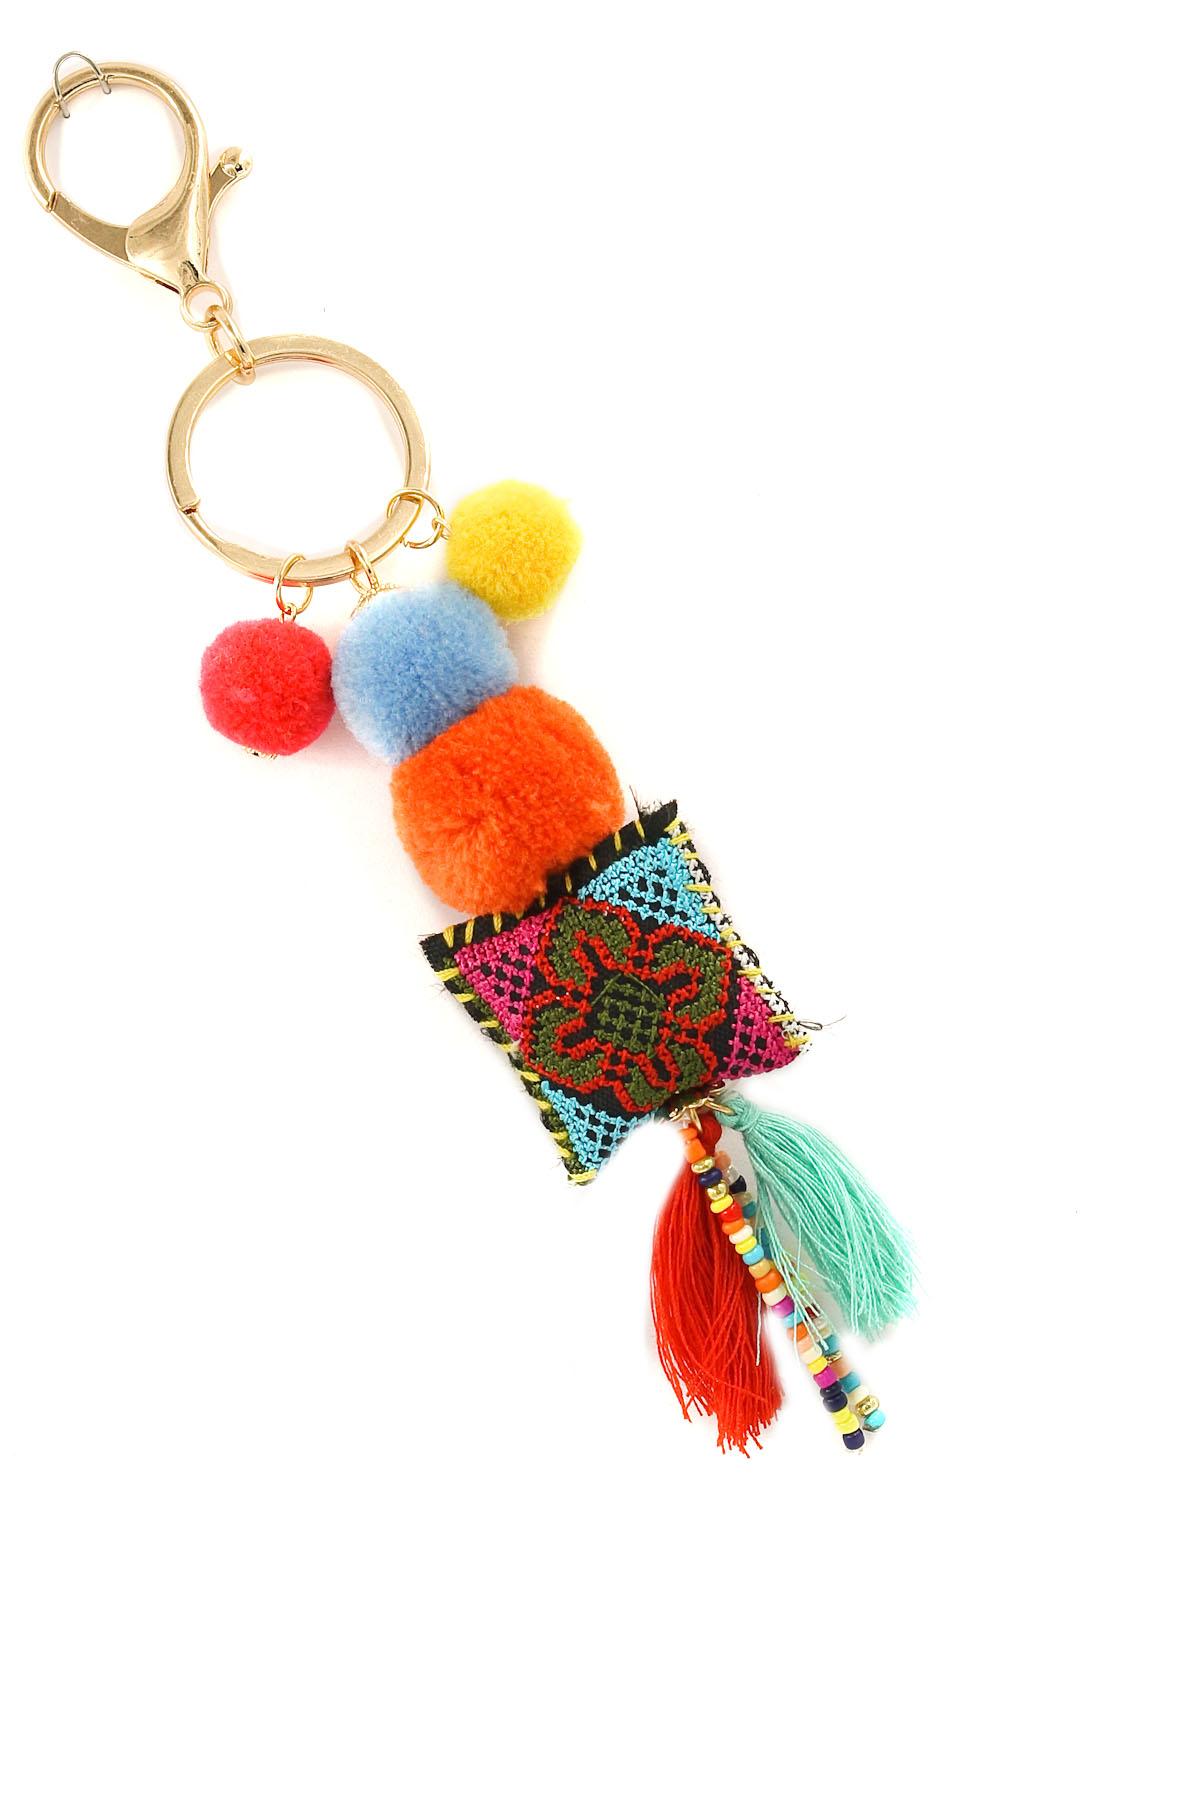 Pom Pom Tassel Key Chain - Key Chains